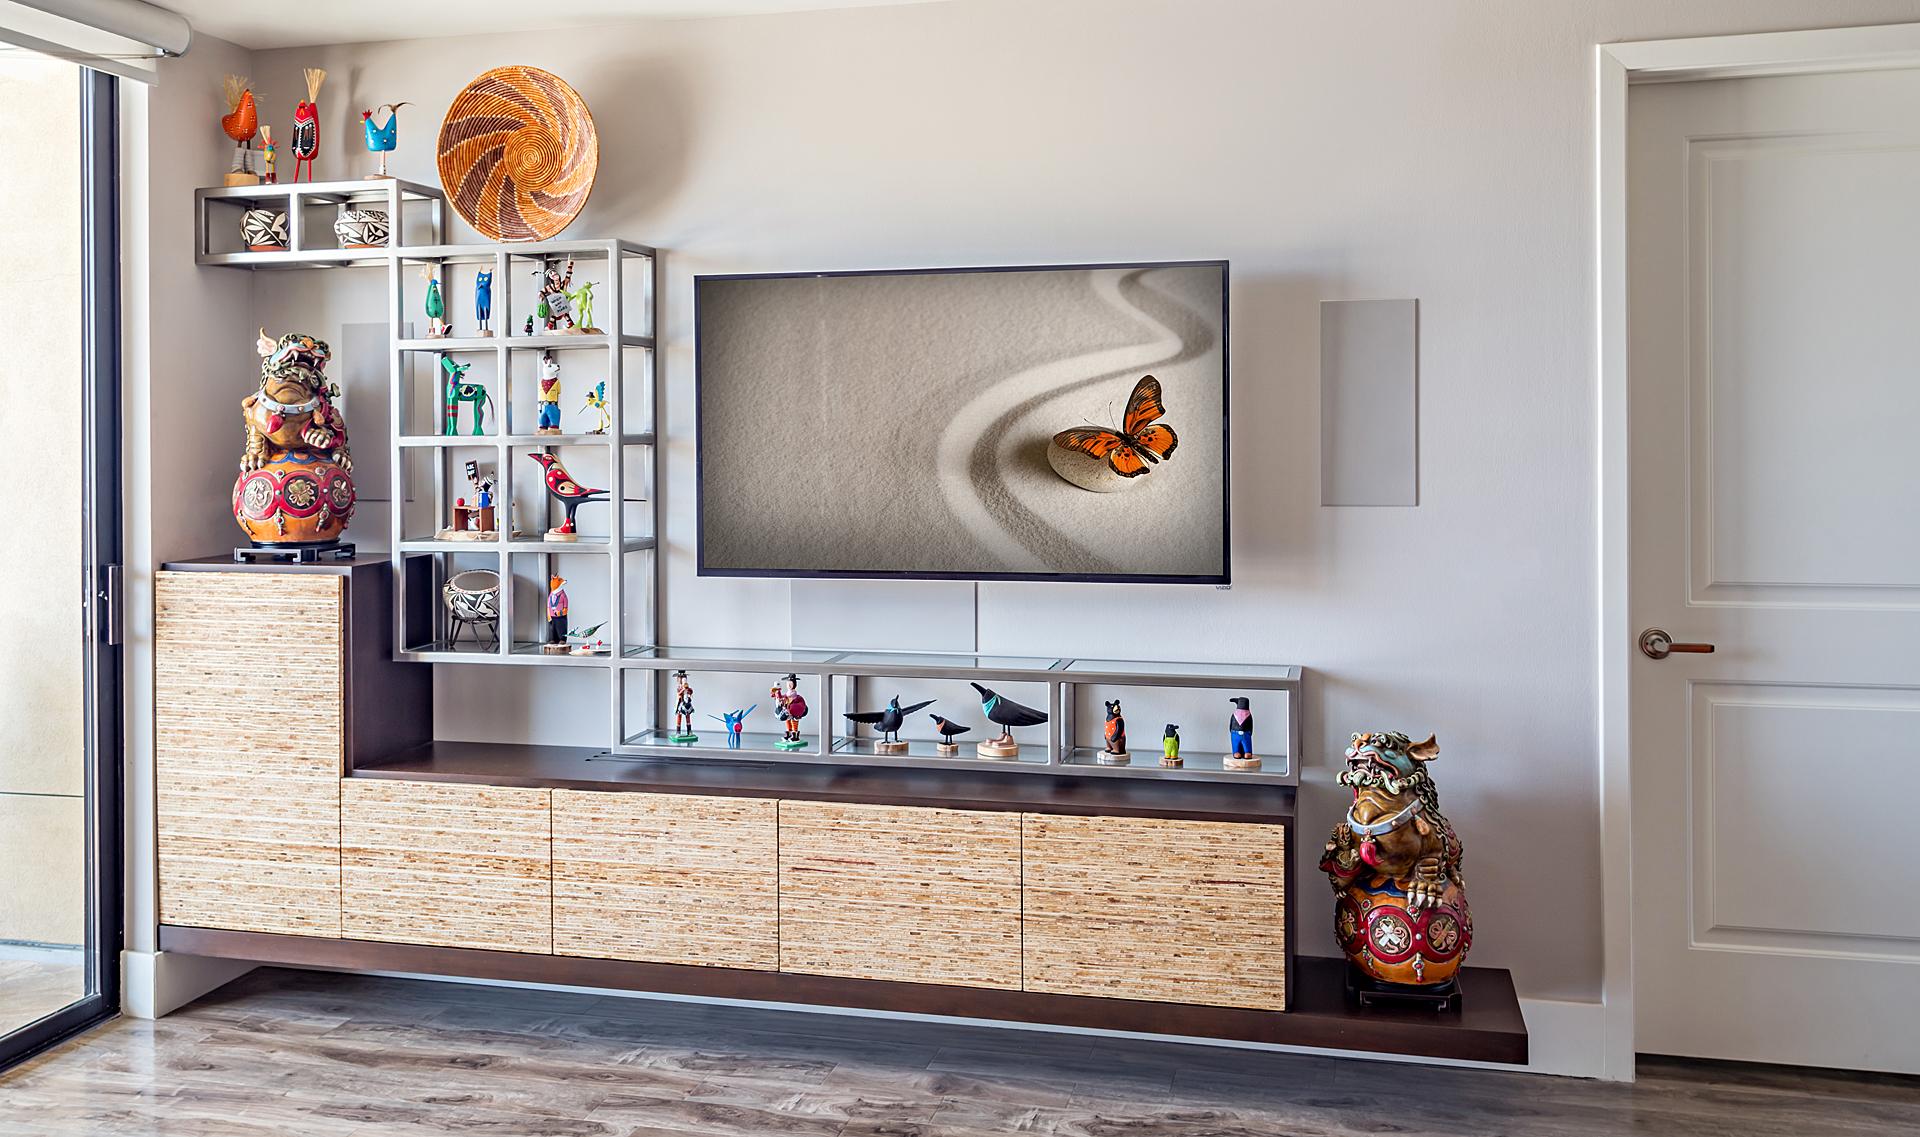 custom-floating-media-cabinet_-wood-mixed-metal-by-paul-rene-furniture-and-cabinets-phoenix-az